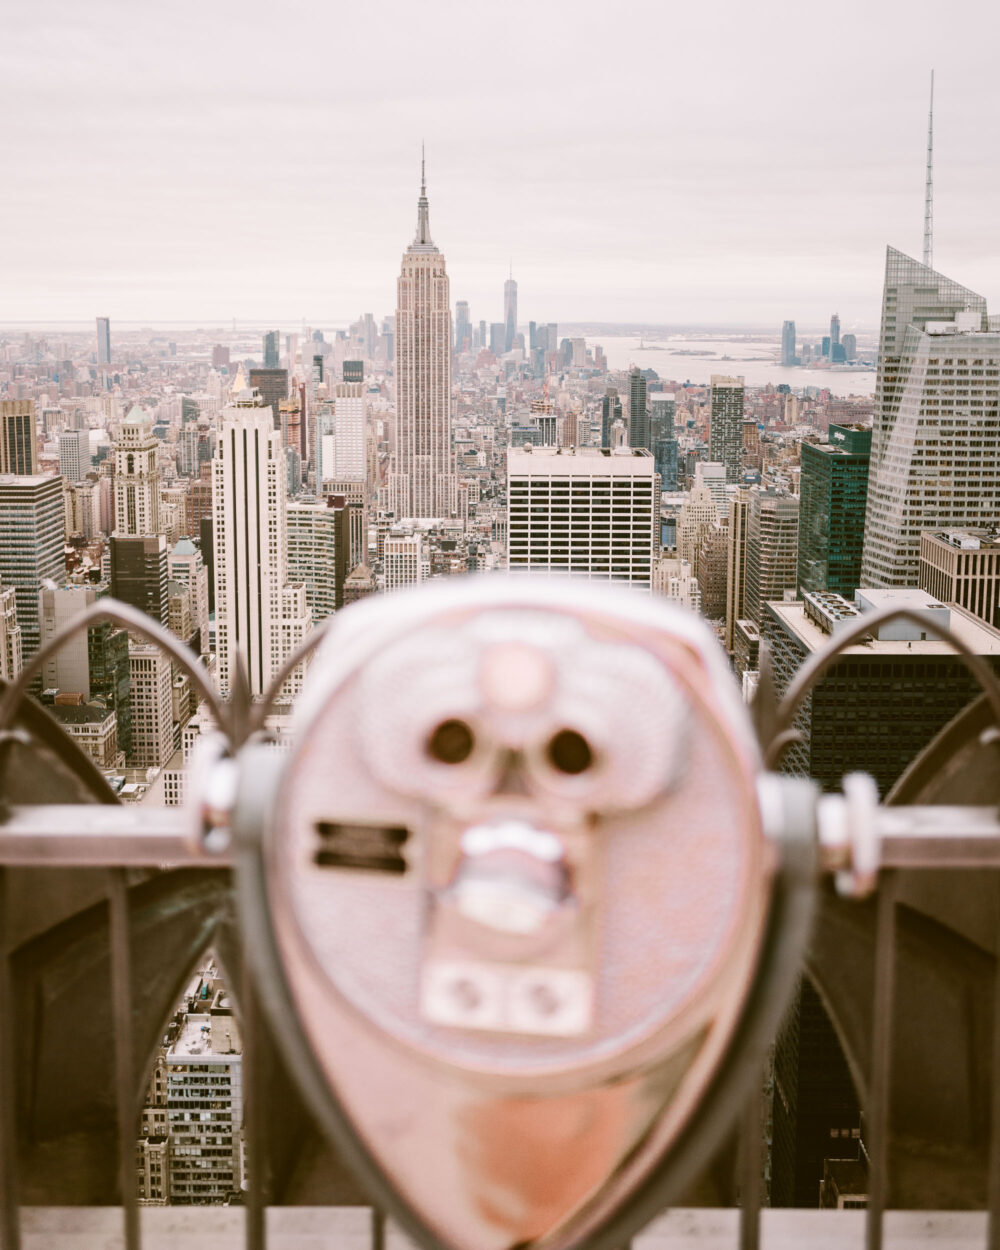 New York Skyline Print Find Us Lost Prints